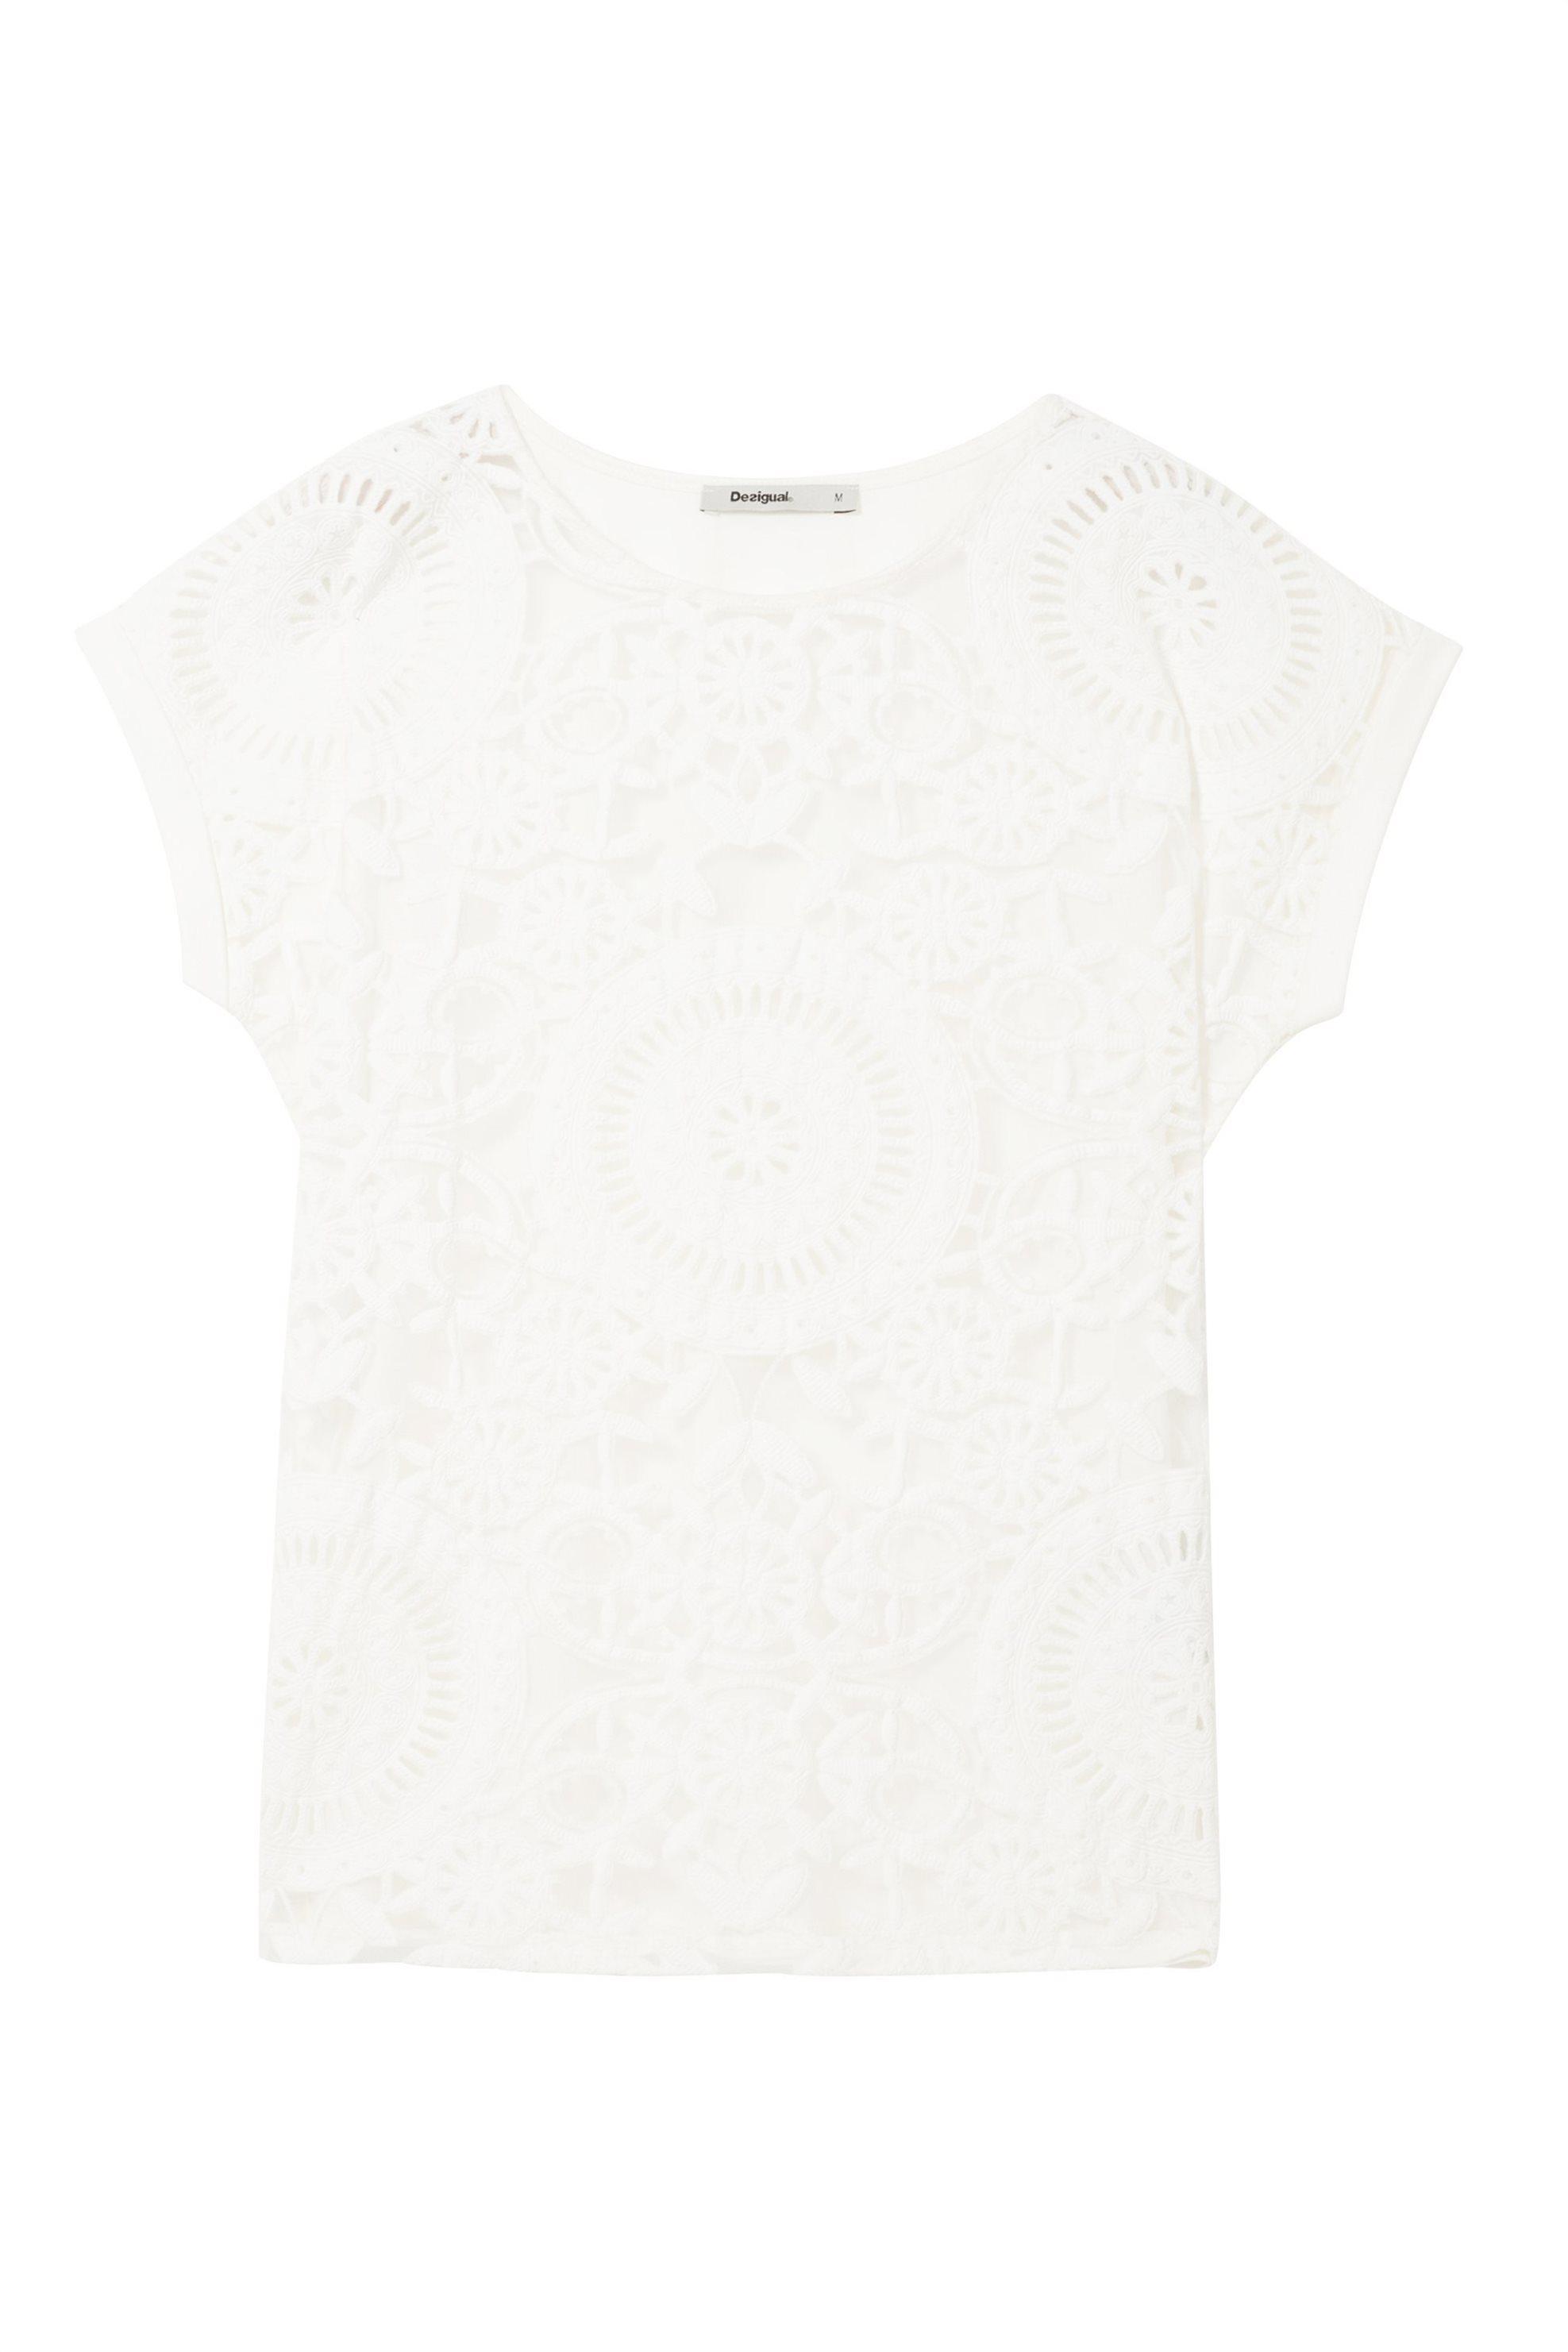 35a51051ca8d Γυναικεία   Ρούχα   Μπλούζες   All Day   Γυναικεία μπλούζα πουά ...